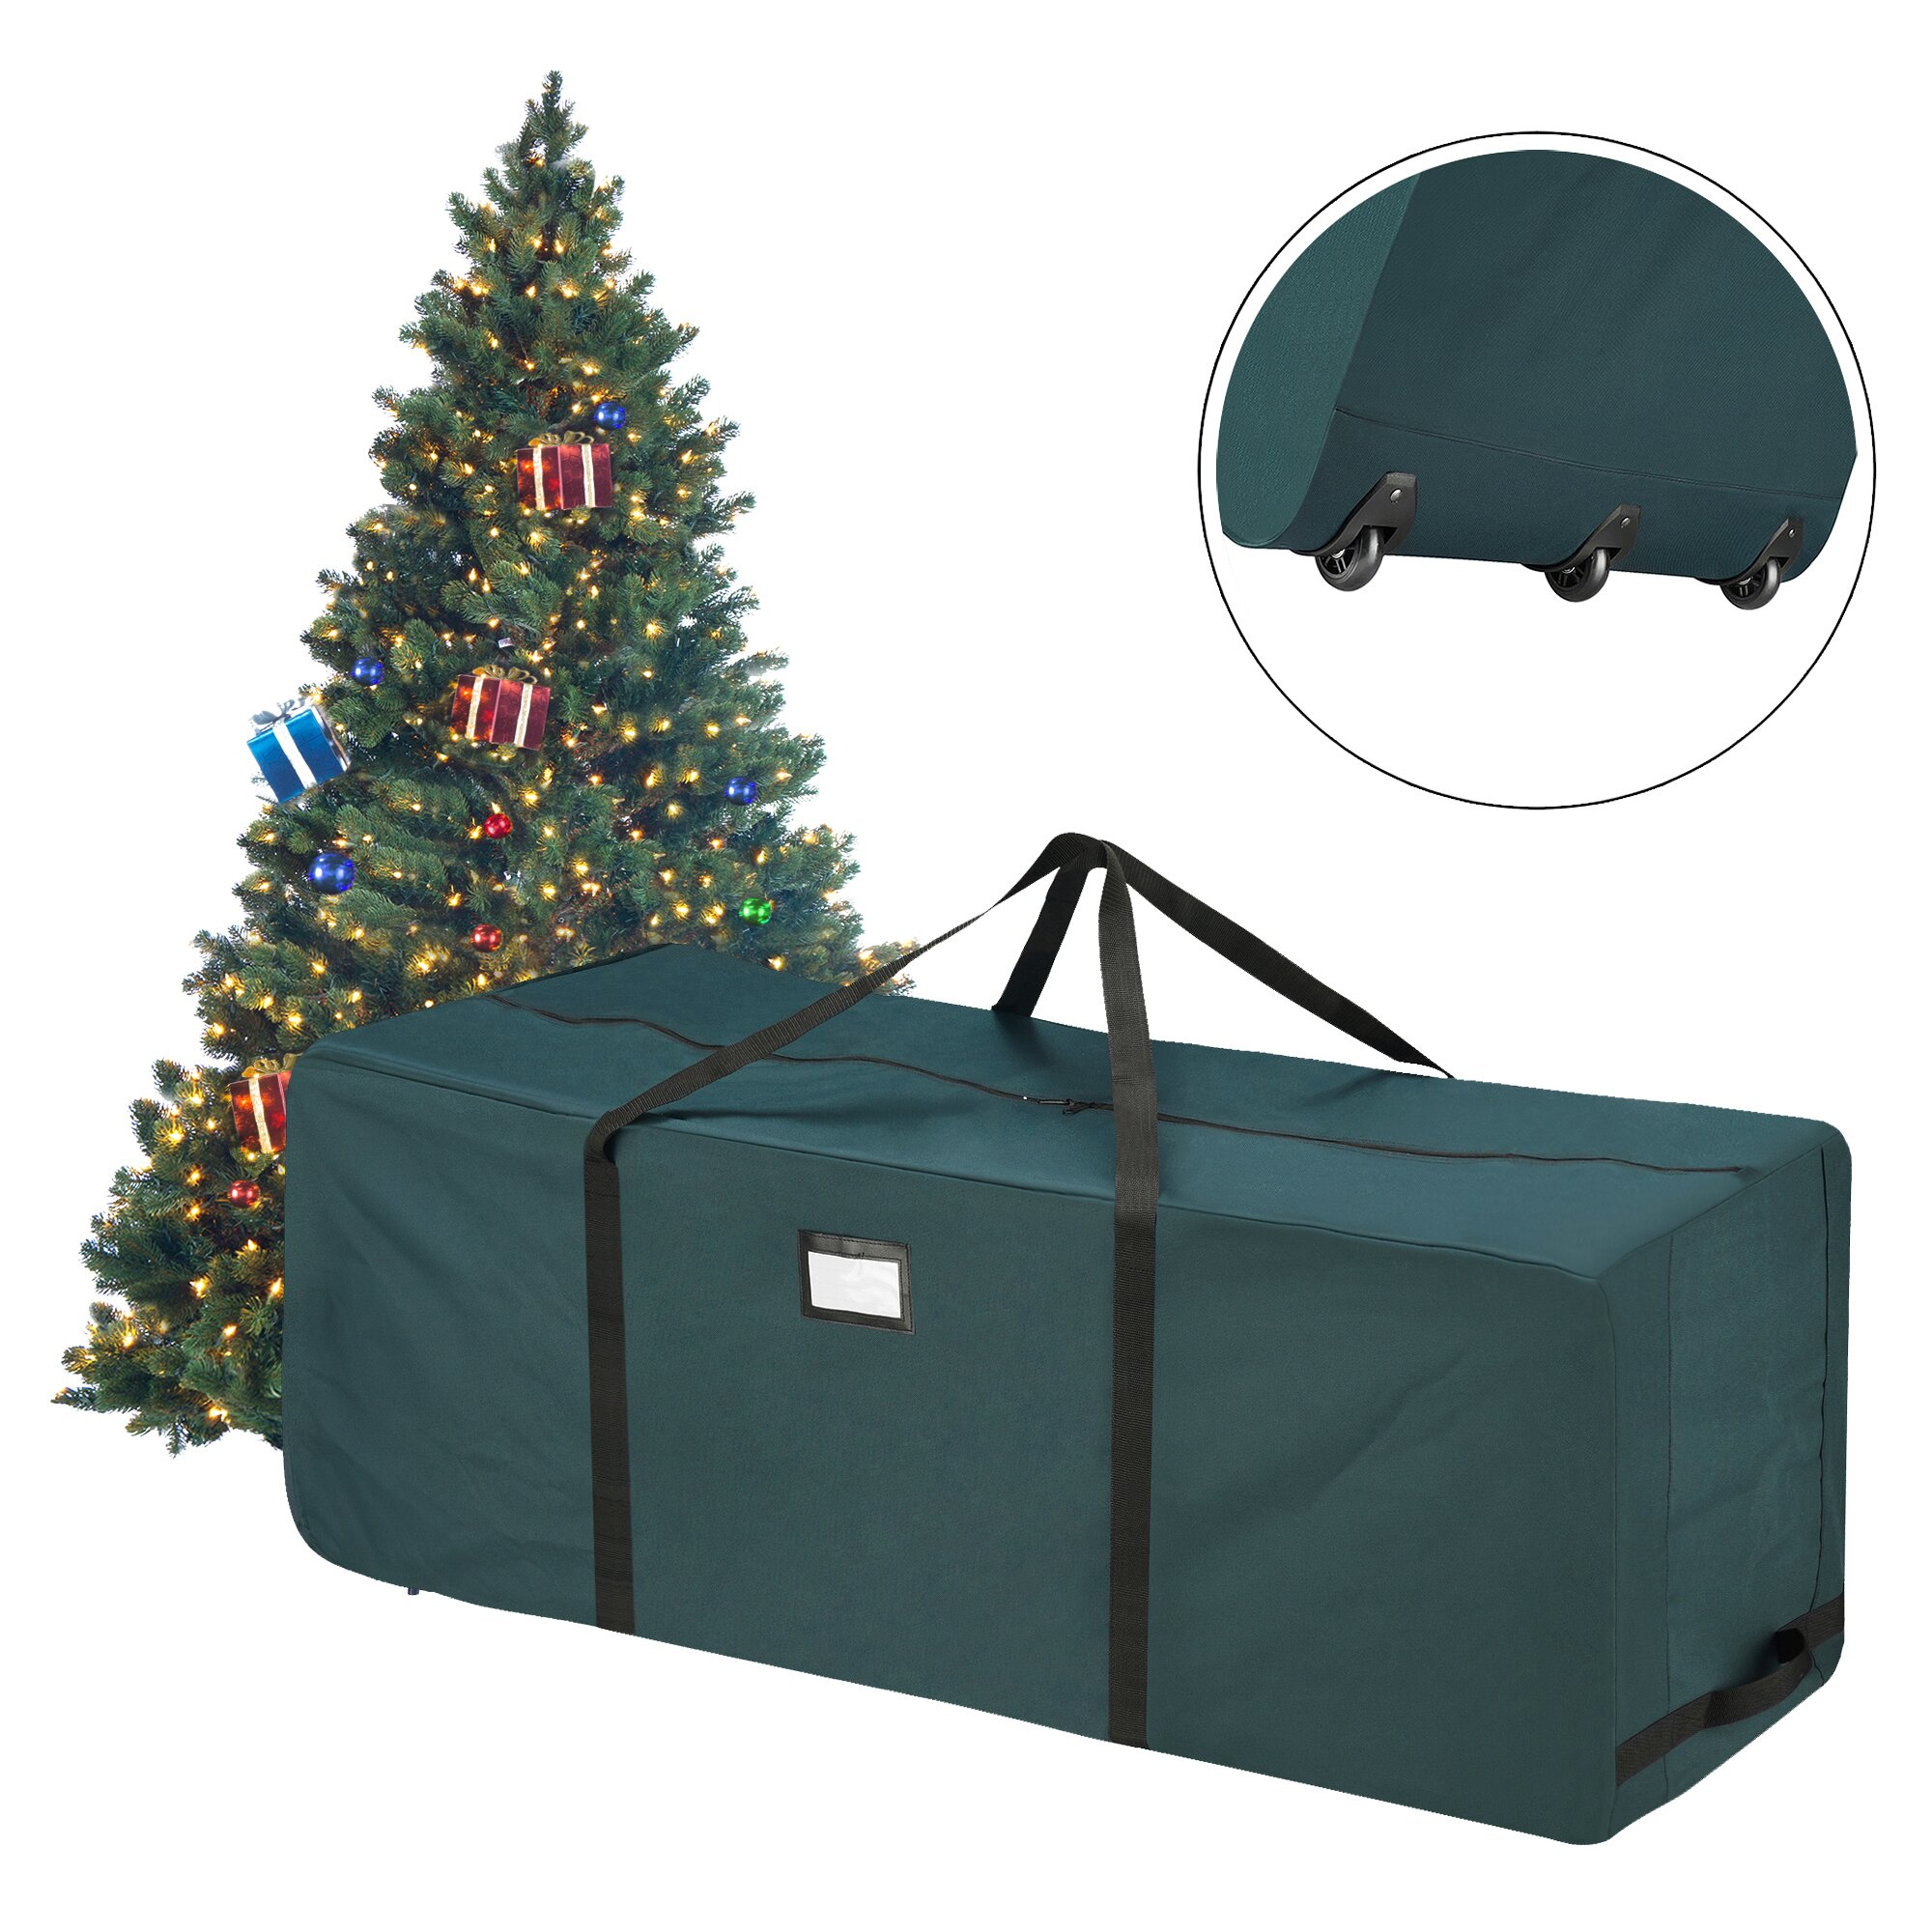 Storage bags for christmas trees - Elf Stor Sellersburg Rolling Duffle Bag Christmas Tree Storage Bag